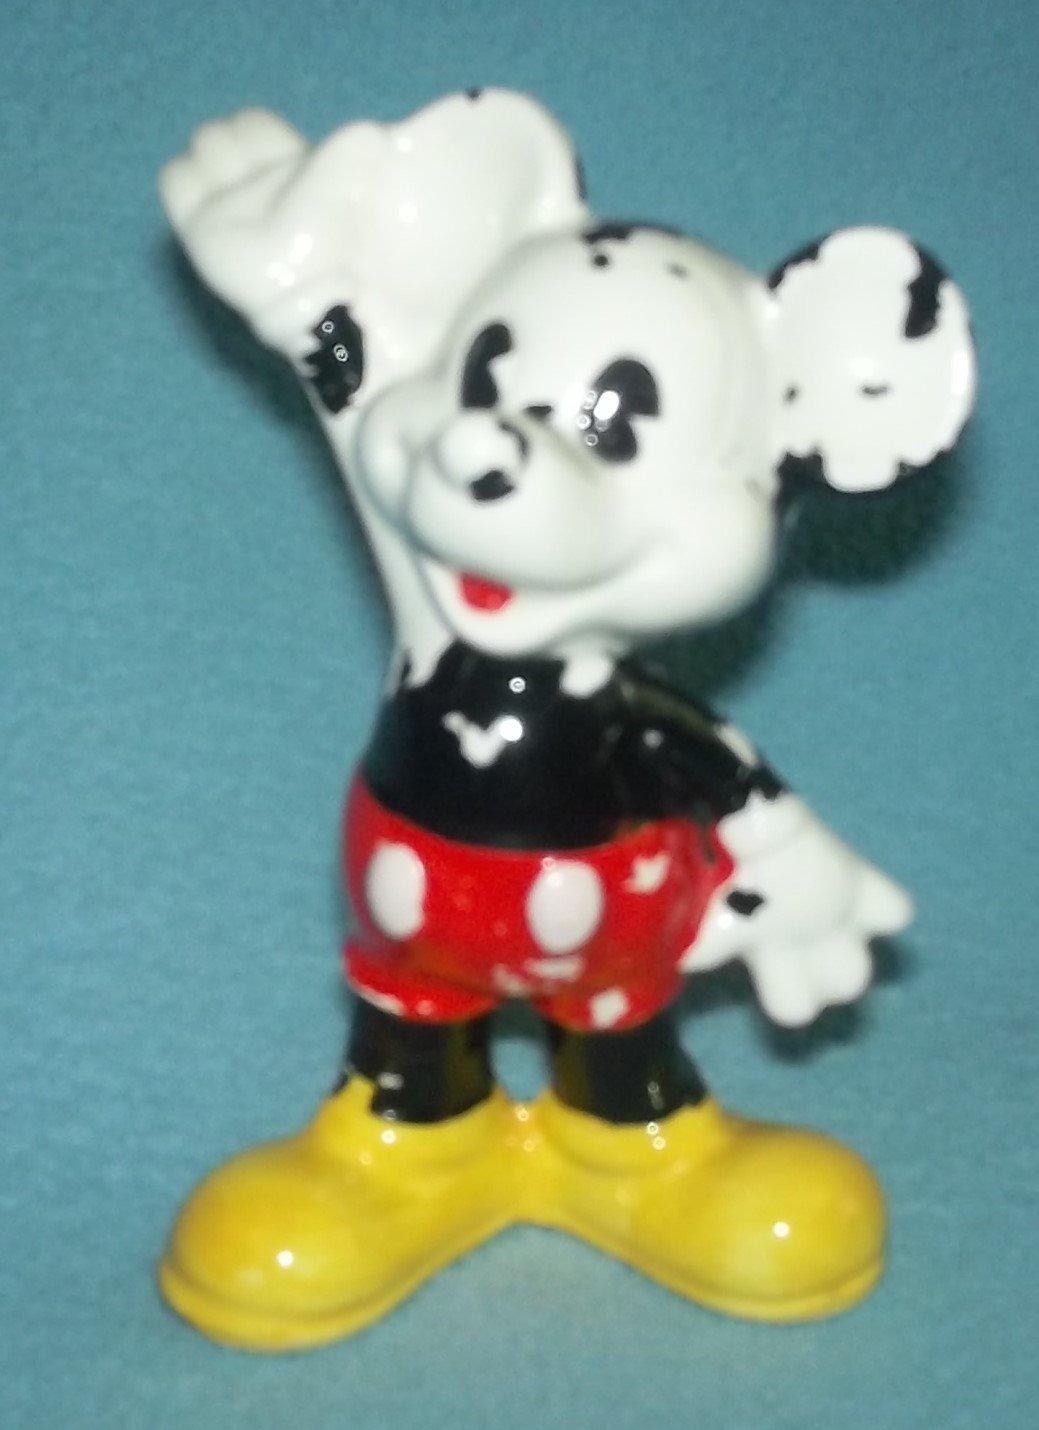 Vintage MICKEY MOUSE Figurine WALT DISNEY PRODUCTIONS Japan Pie Eyed